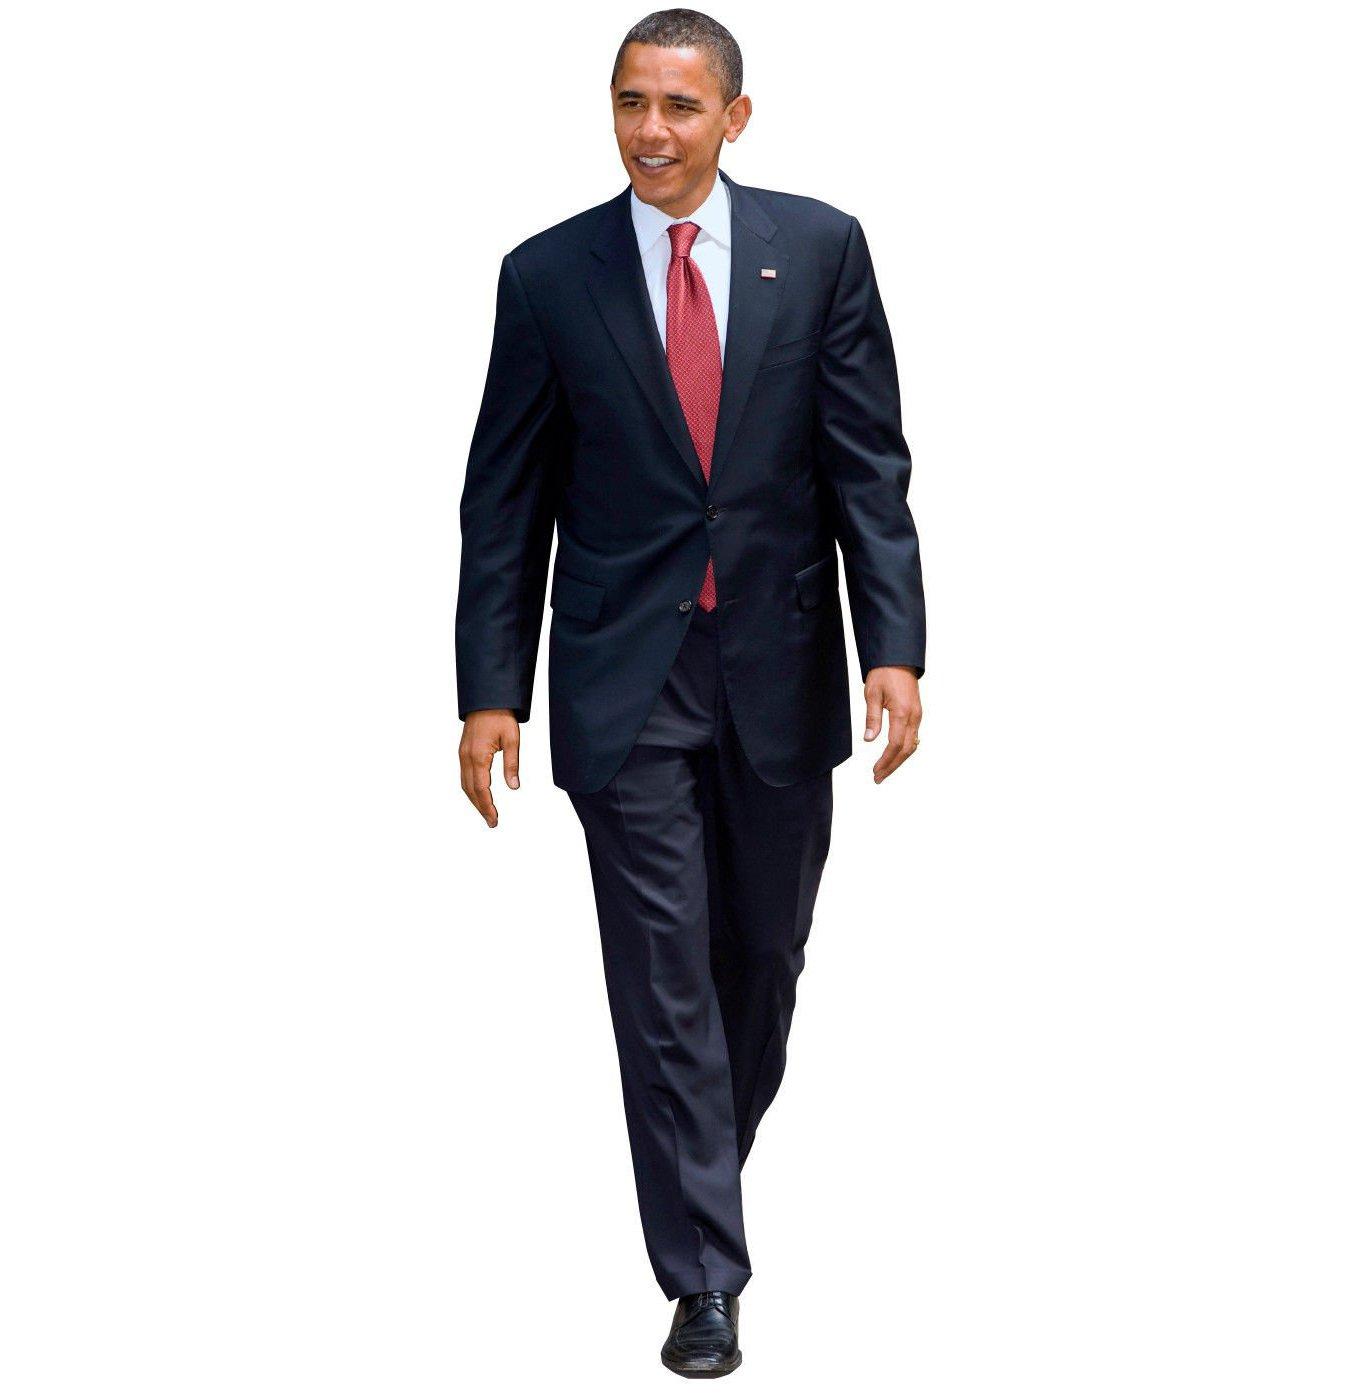 Barack Obama Cutout Standup President White House ...